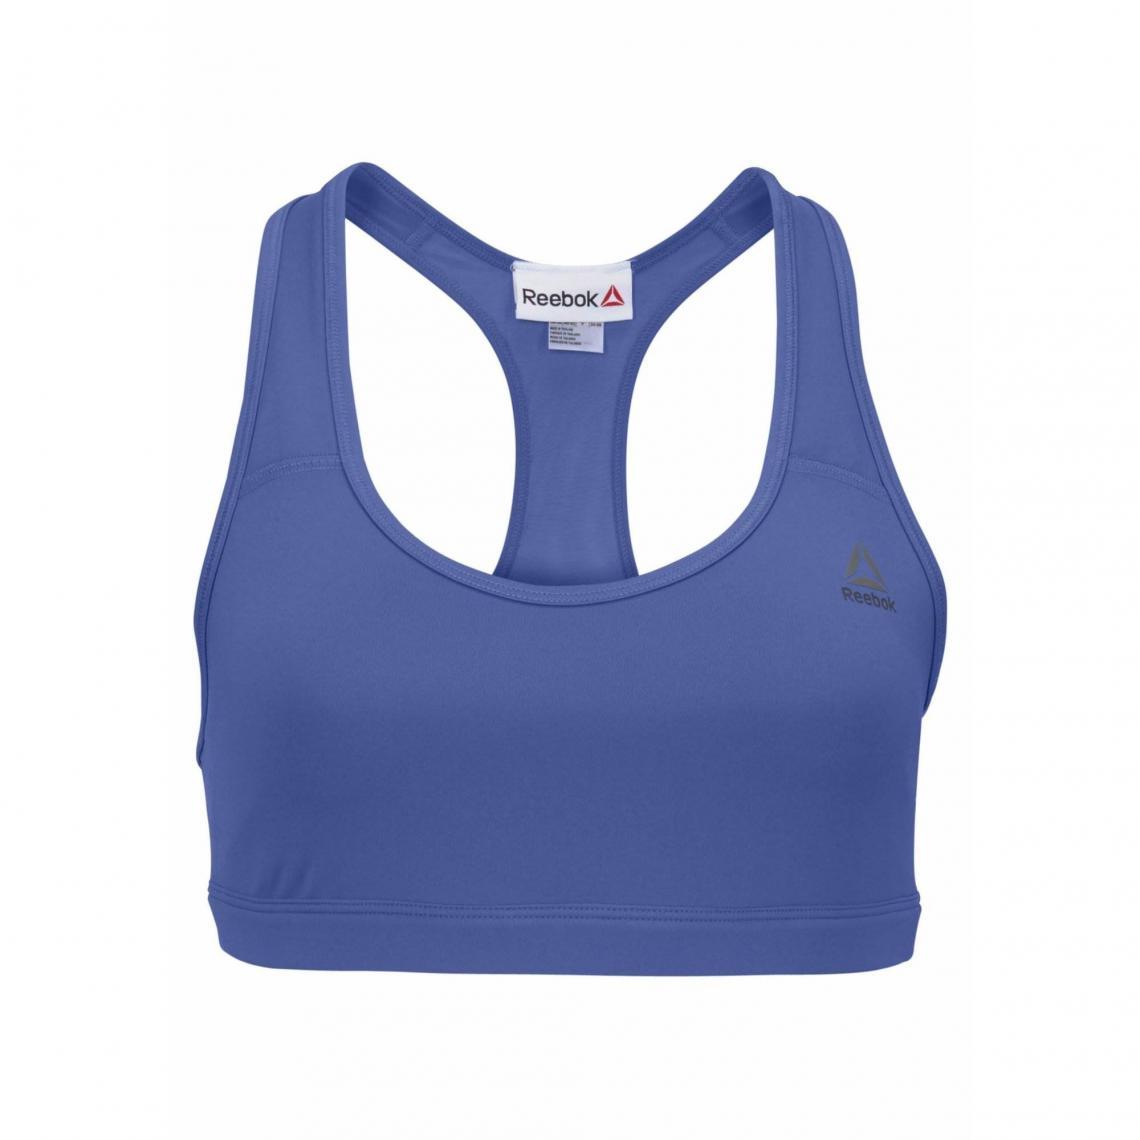 Brassière sport dos nageur femme Reebok - Bleu Reebok e03bdb7b6b8